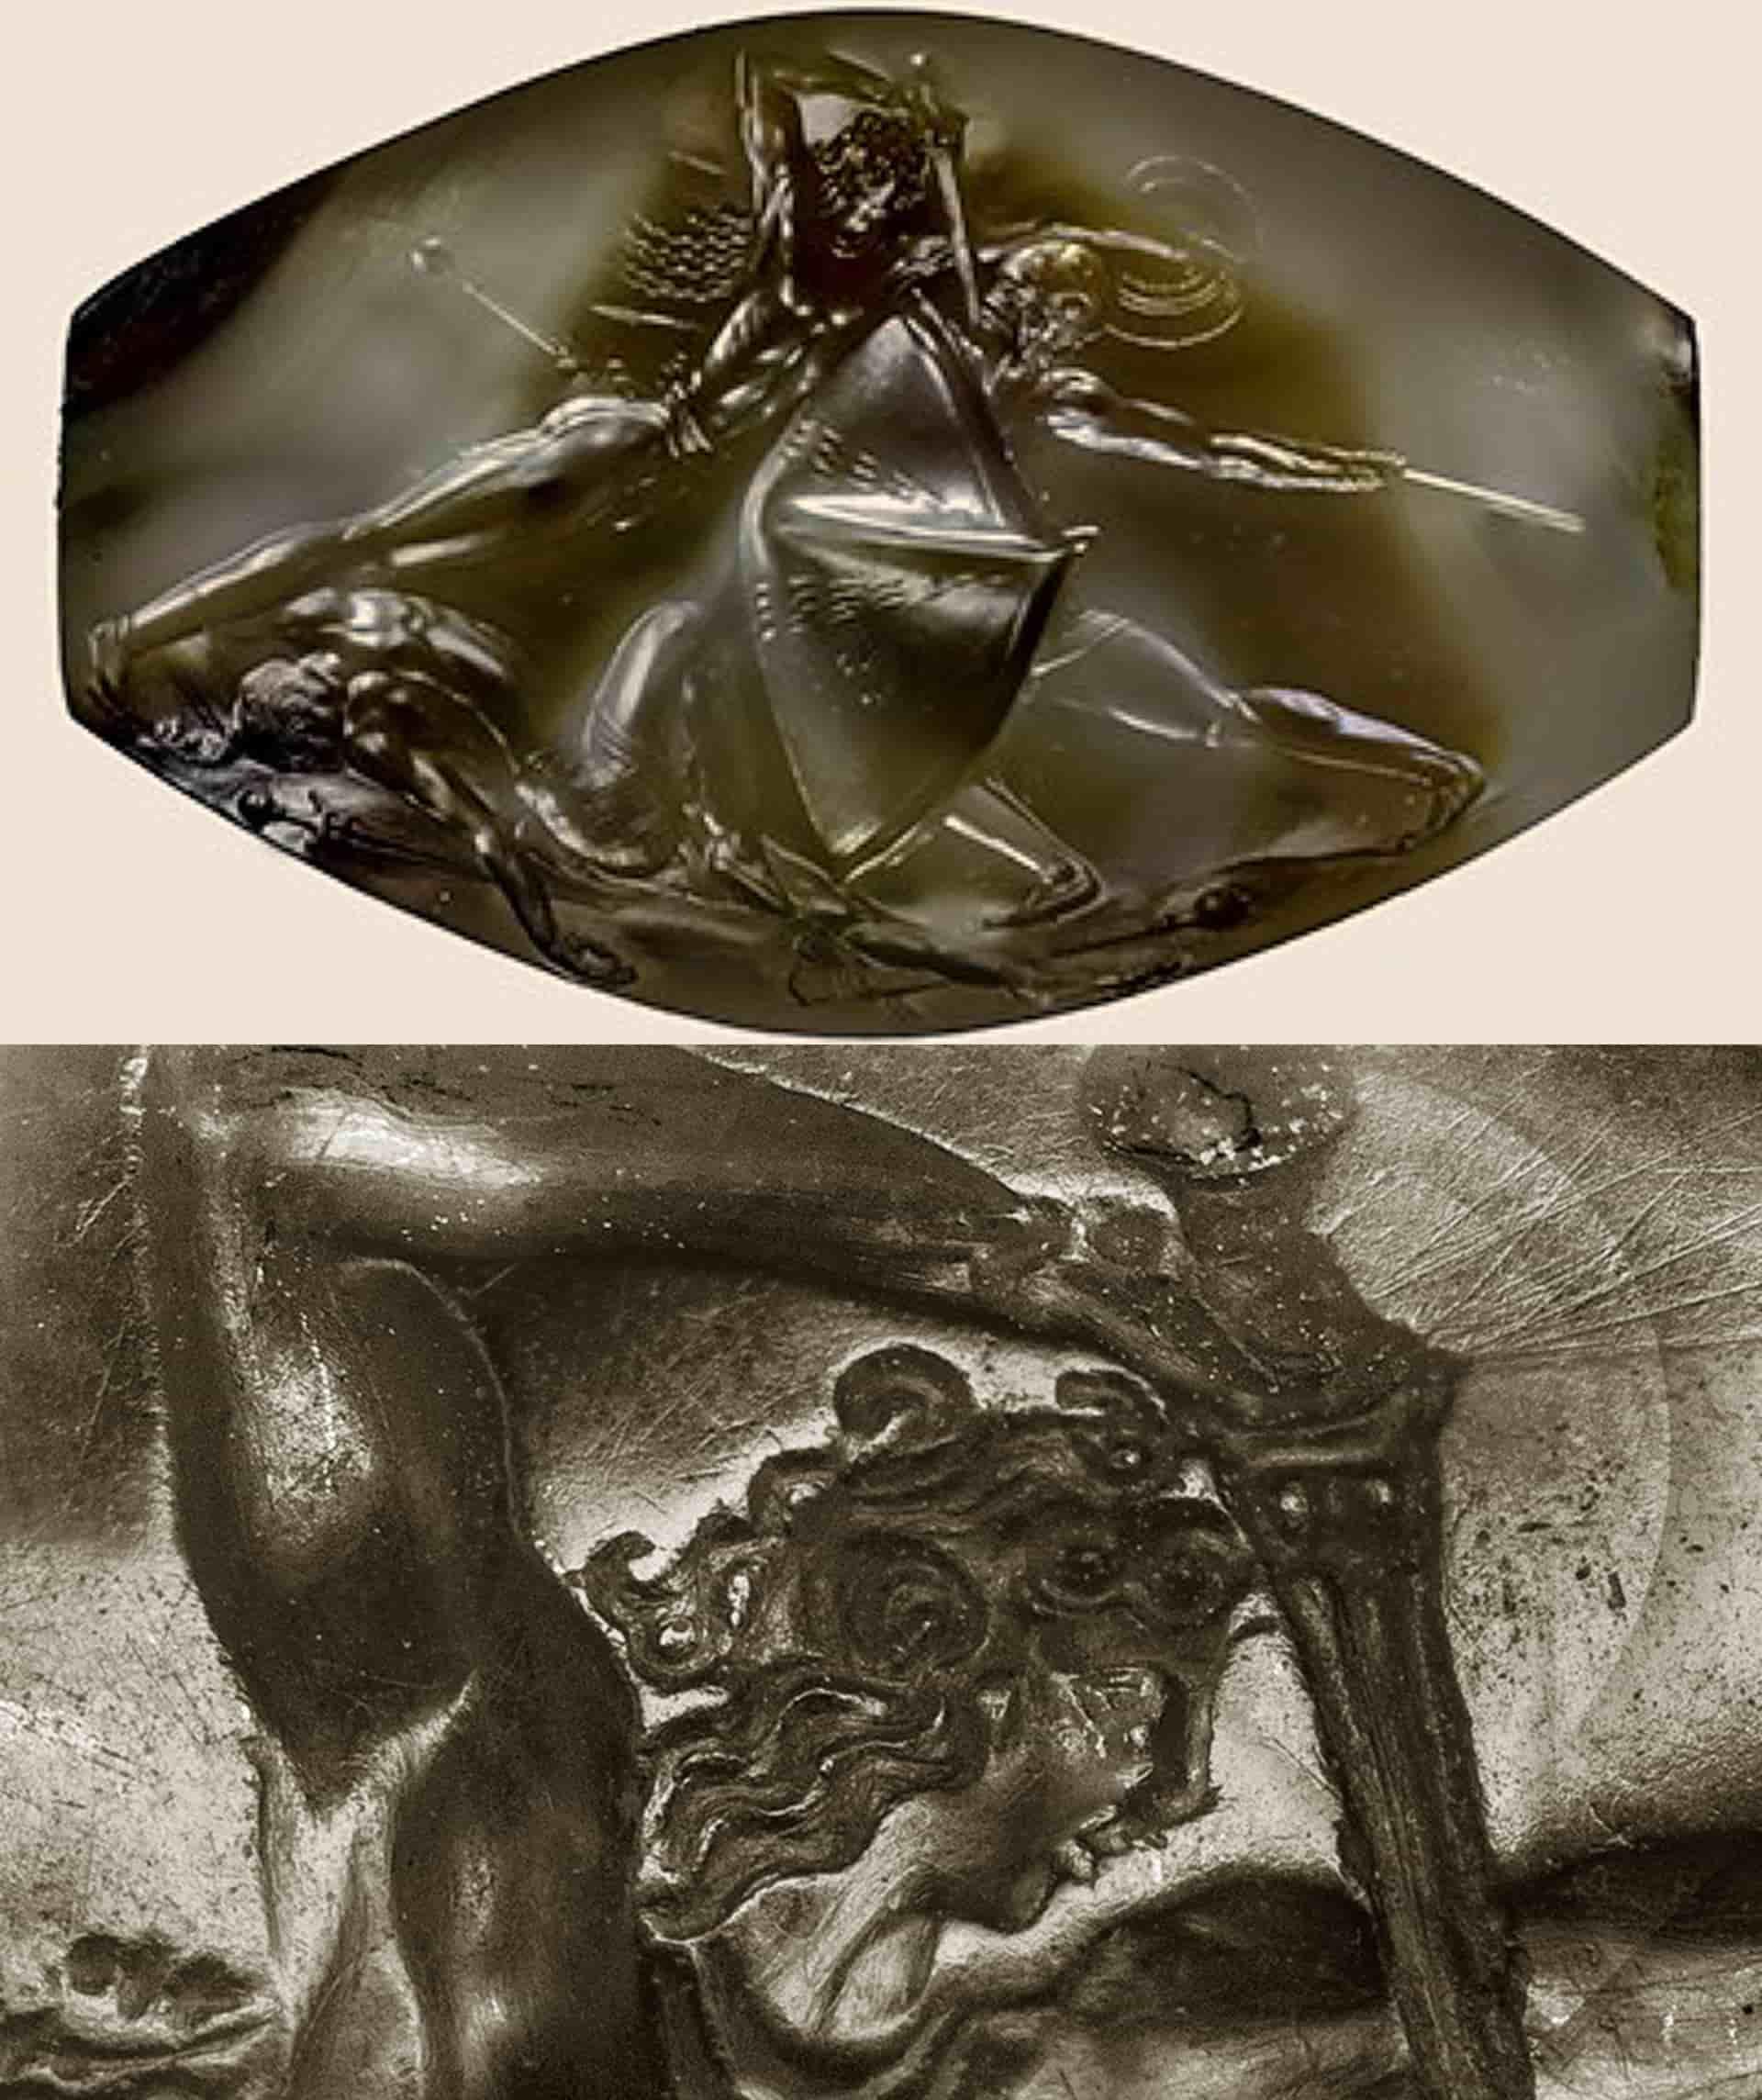 LASER και ΝΑΝΟΤΕΧΝΟΛΟΓΙΑ στον ΣΦΡΑΓΙΔΟΛΙΘΟ της ΠΥΛΟΥ του 1500 π.Χ.!!!